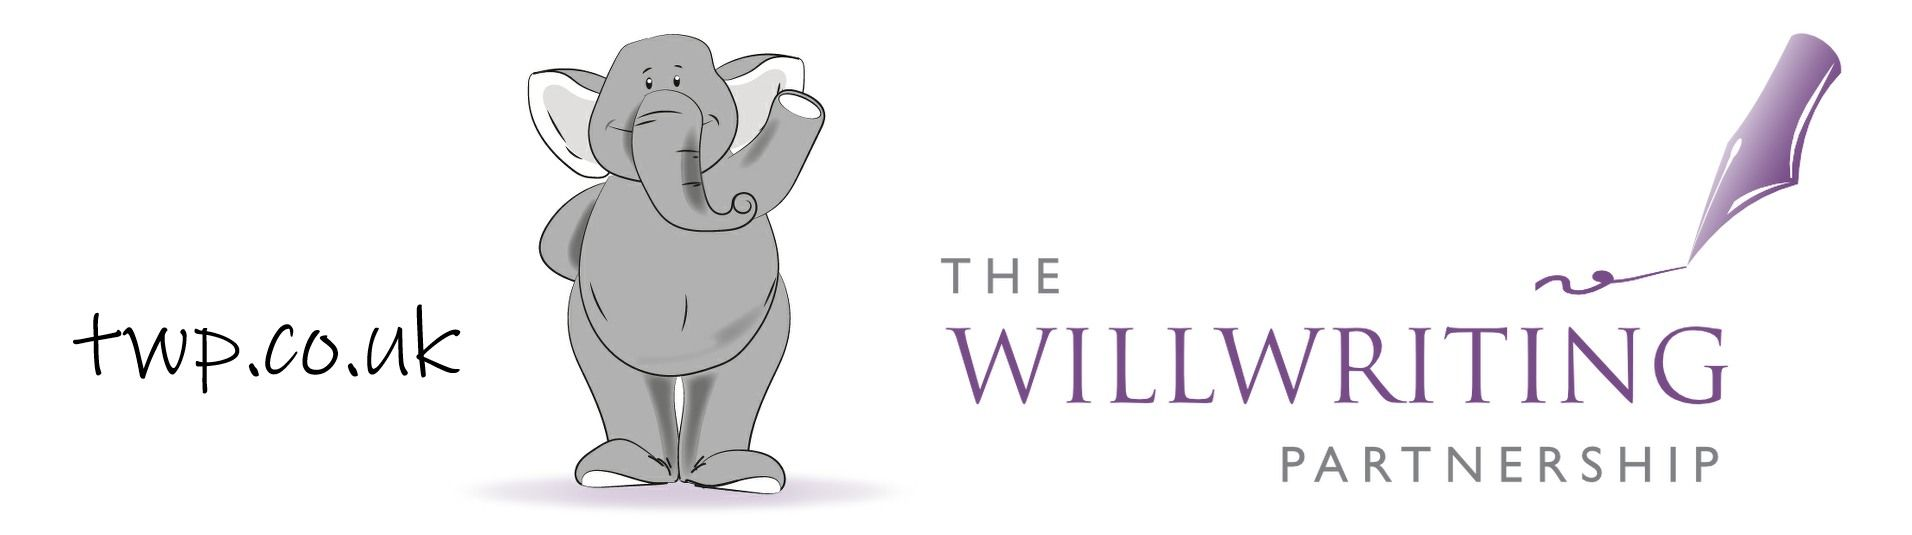 The Willwriting Partnership